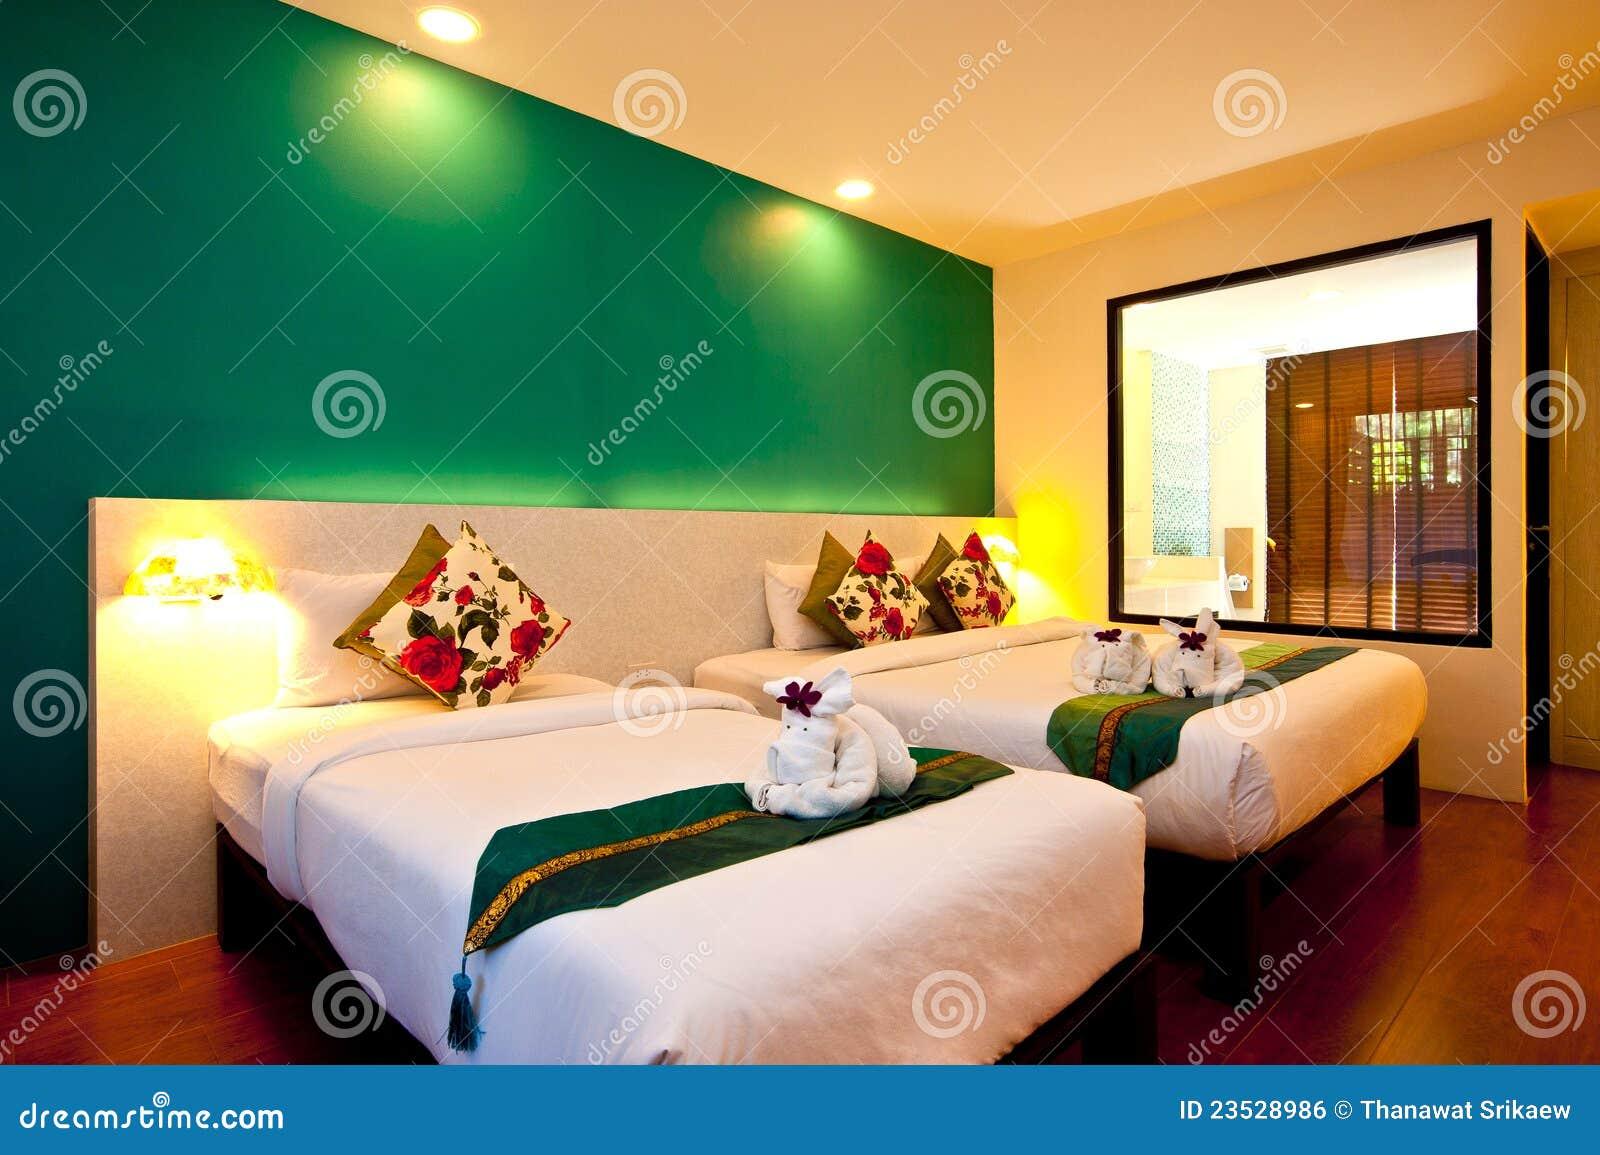 Bedroom Hotel Series 01